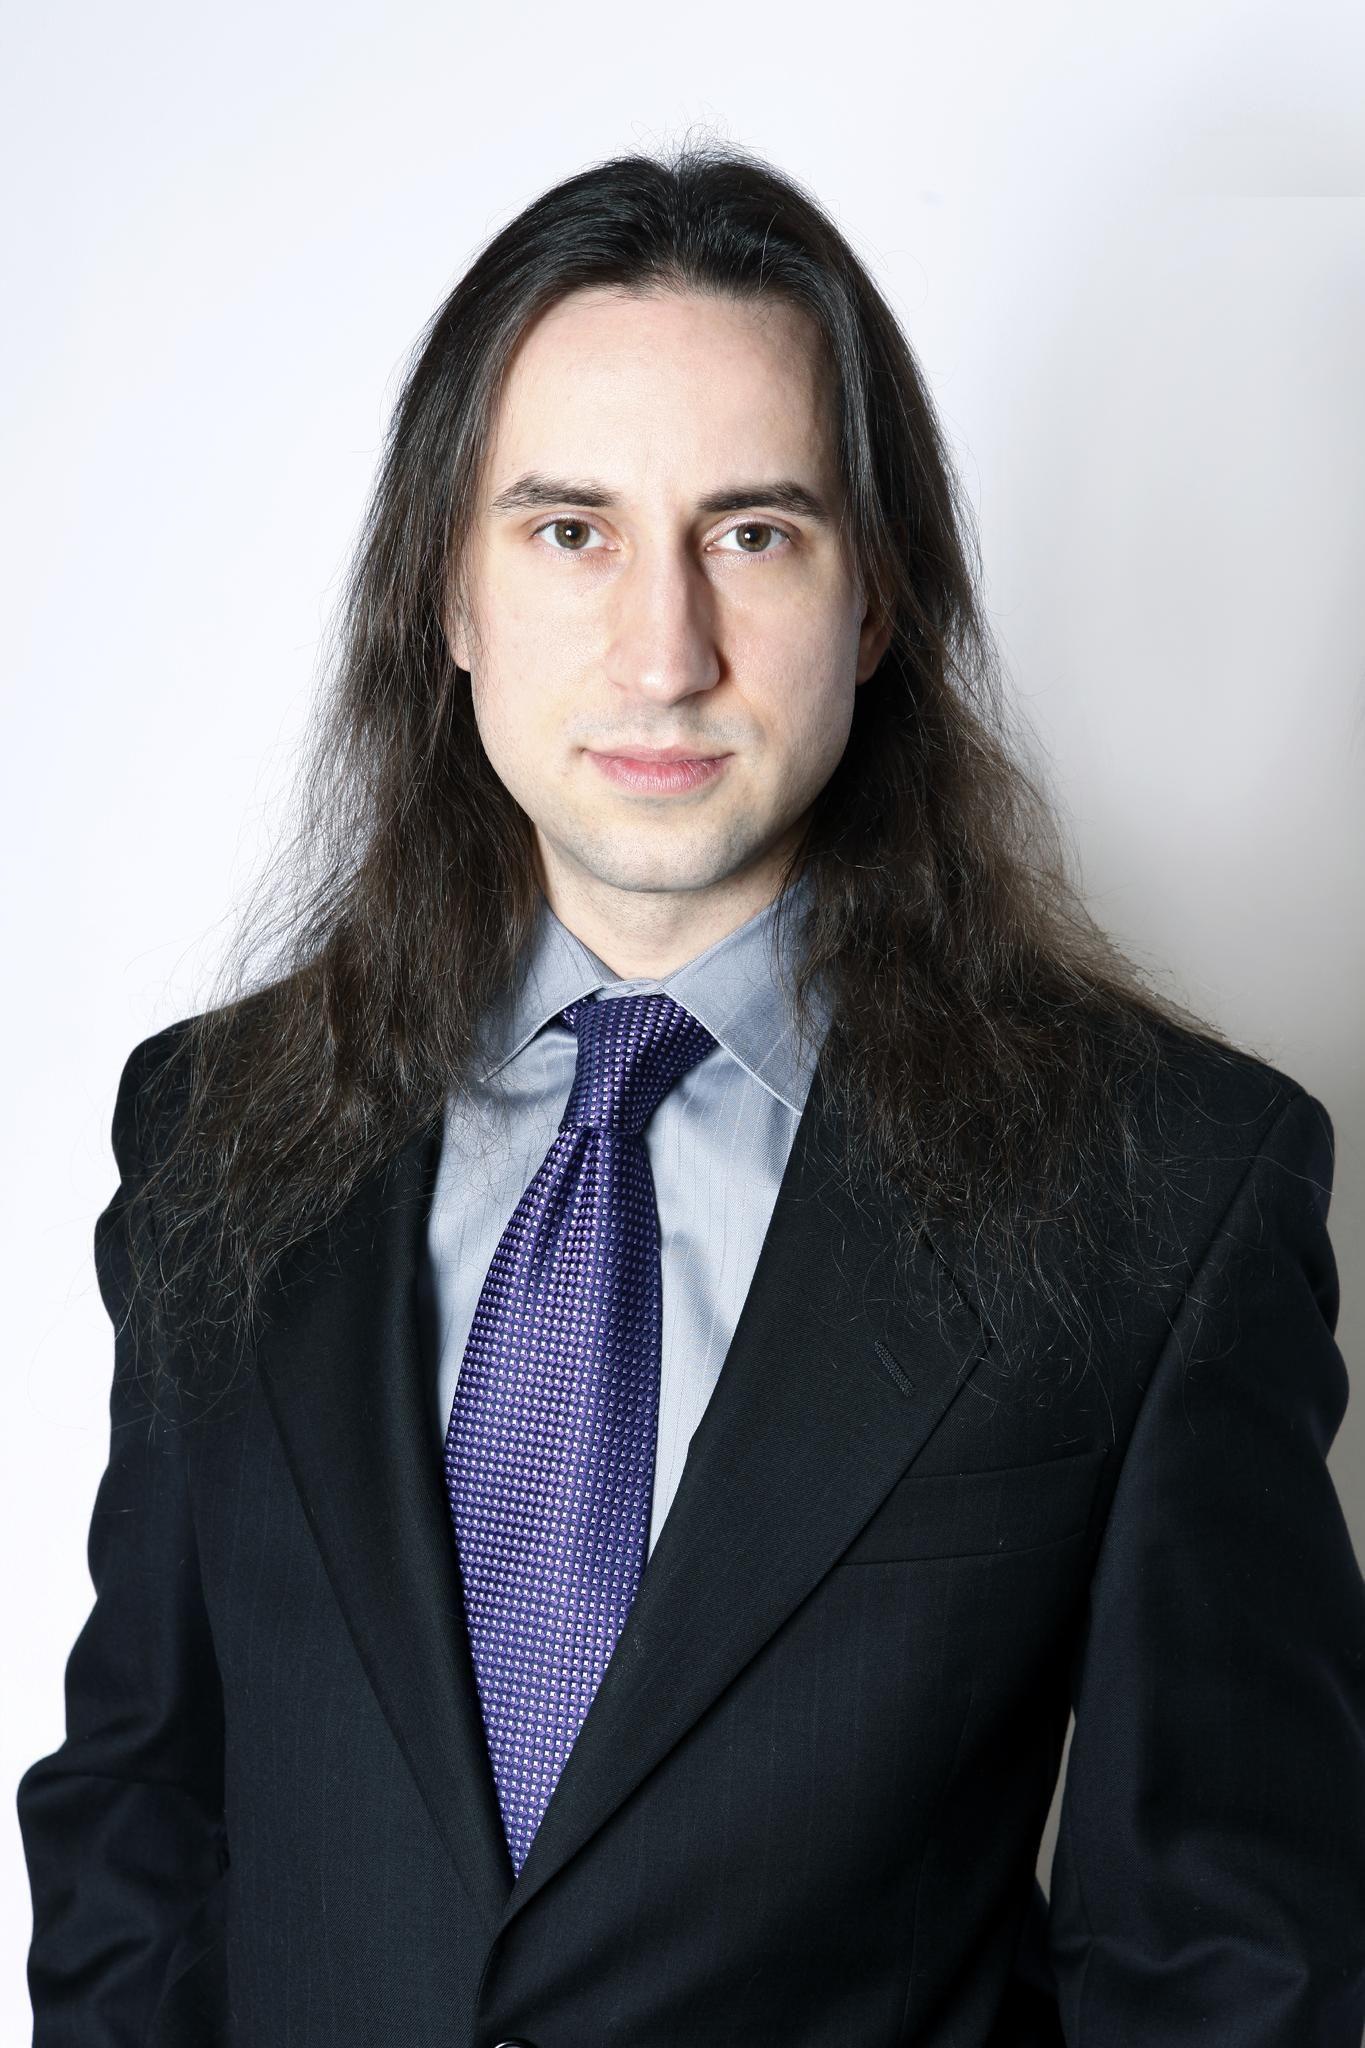 Andrew Baranowski